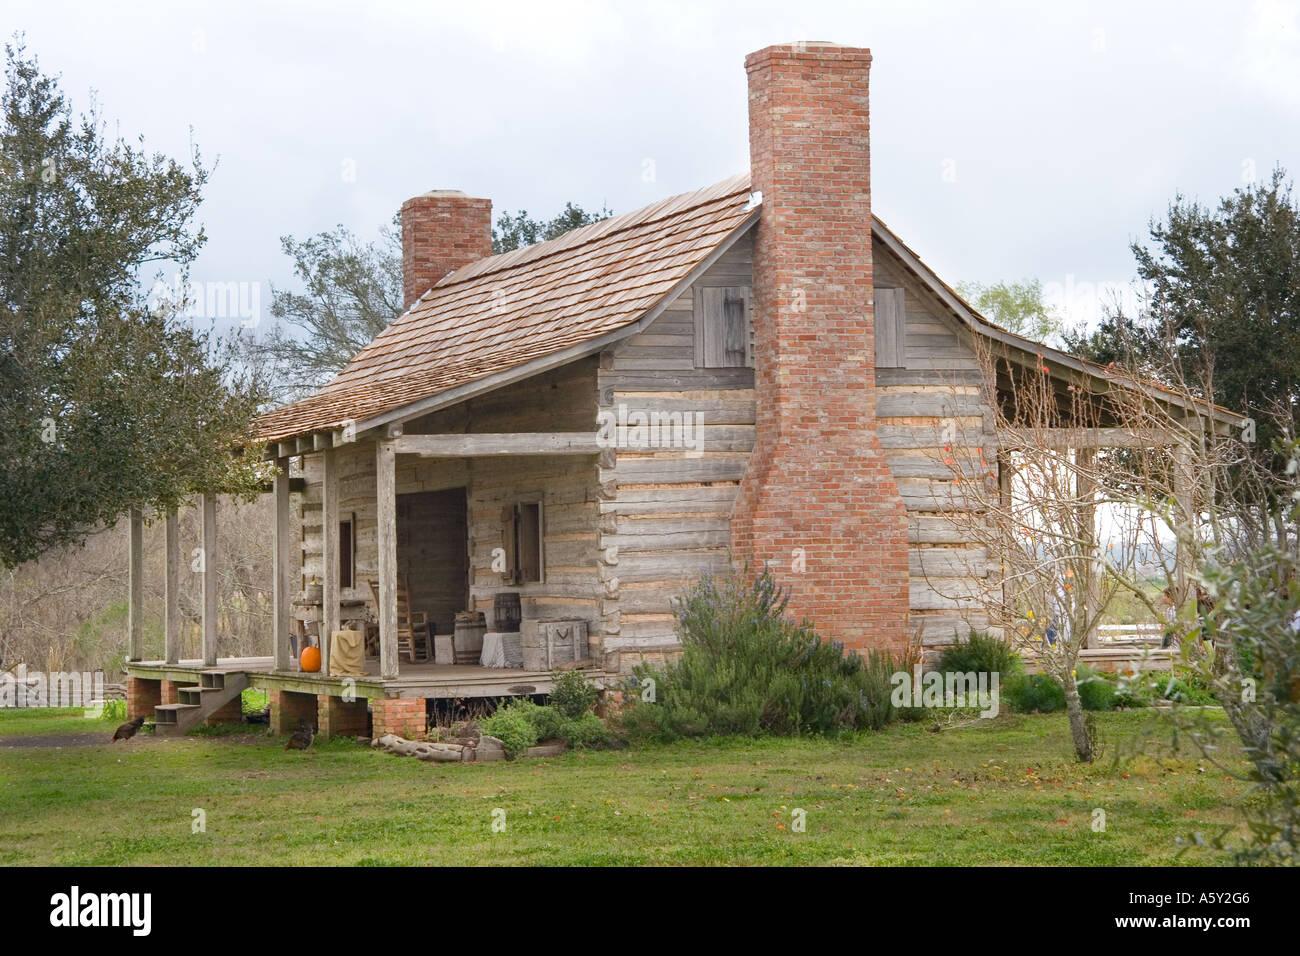 Side View, Dogtrot Cabin, Farmland, Texas 1830's - Stock Image